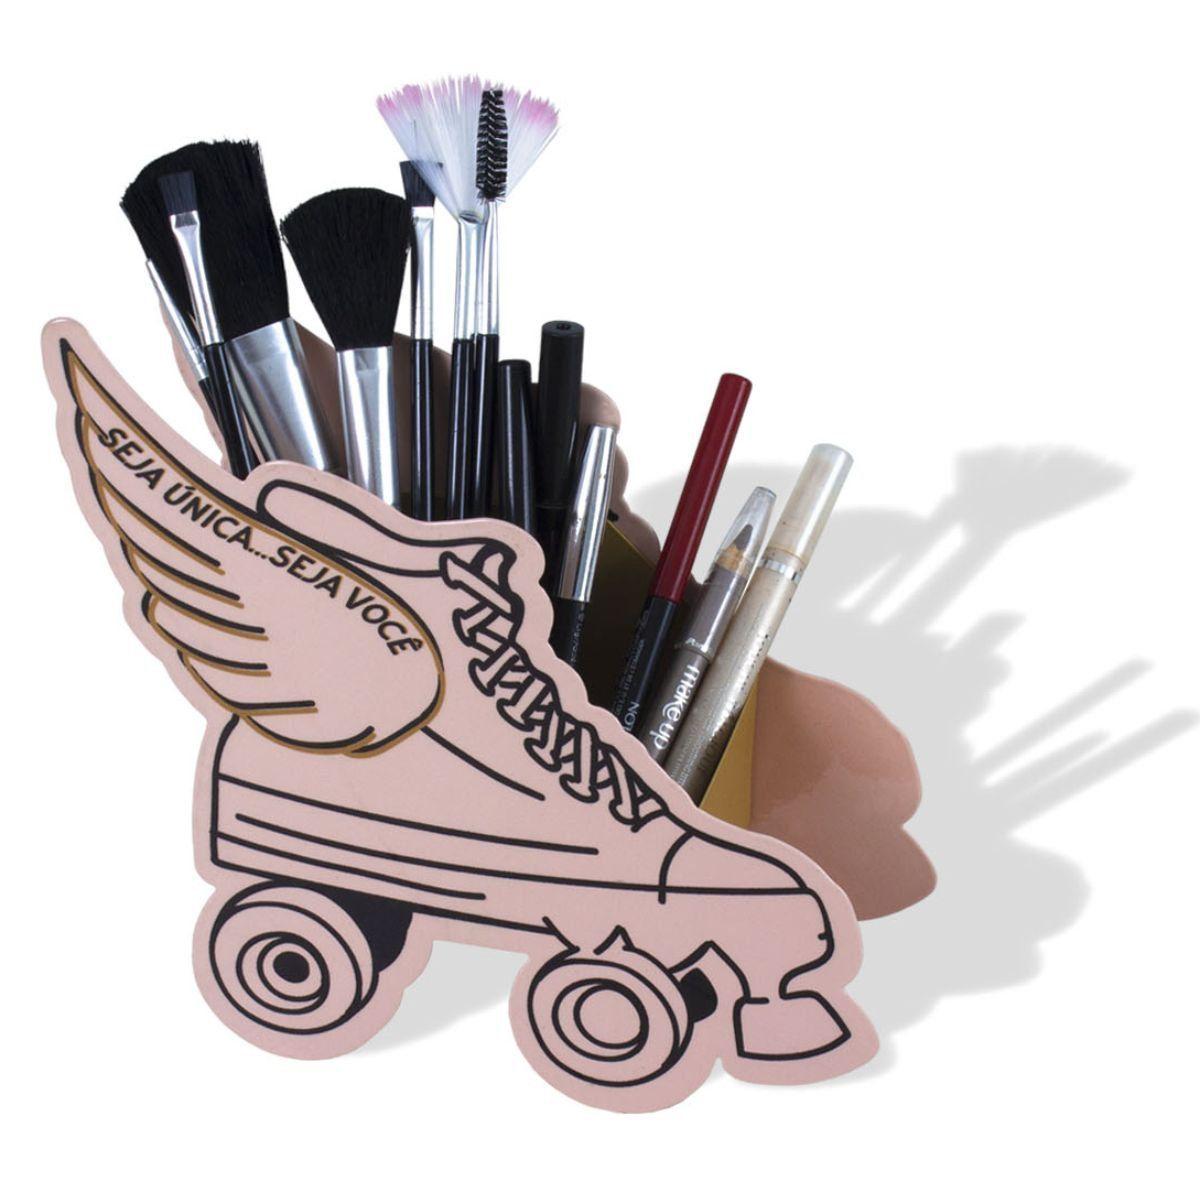 Organizador de Pincéis Maquiagem Patins Seja Única